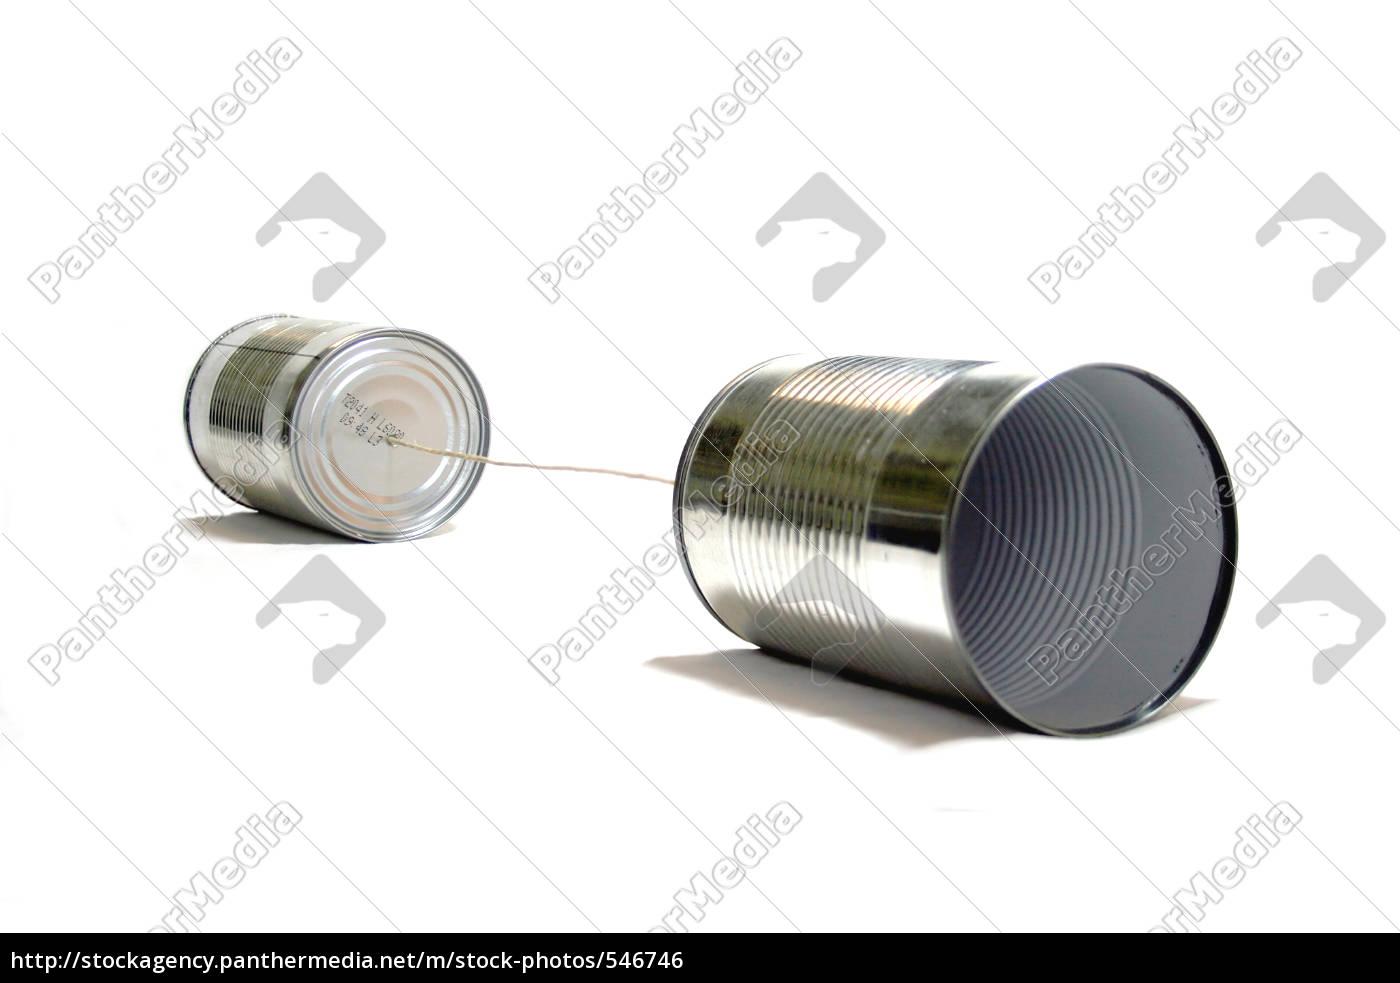 dosentelefon - 546746